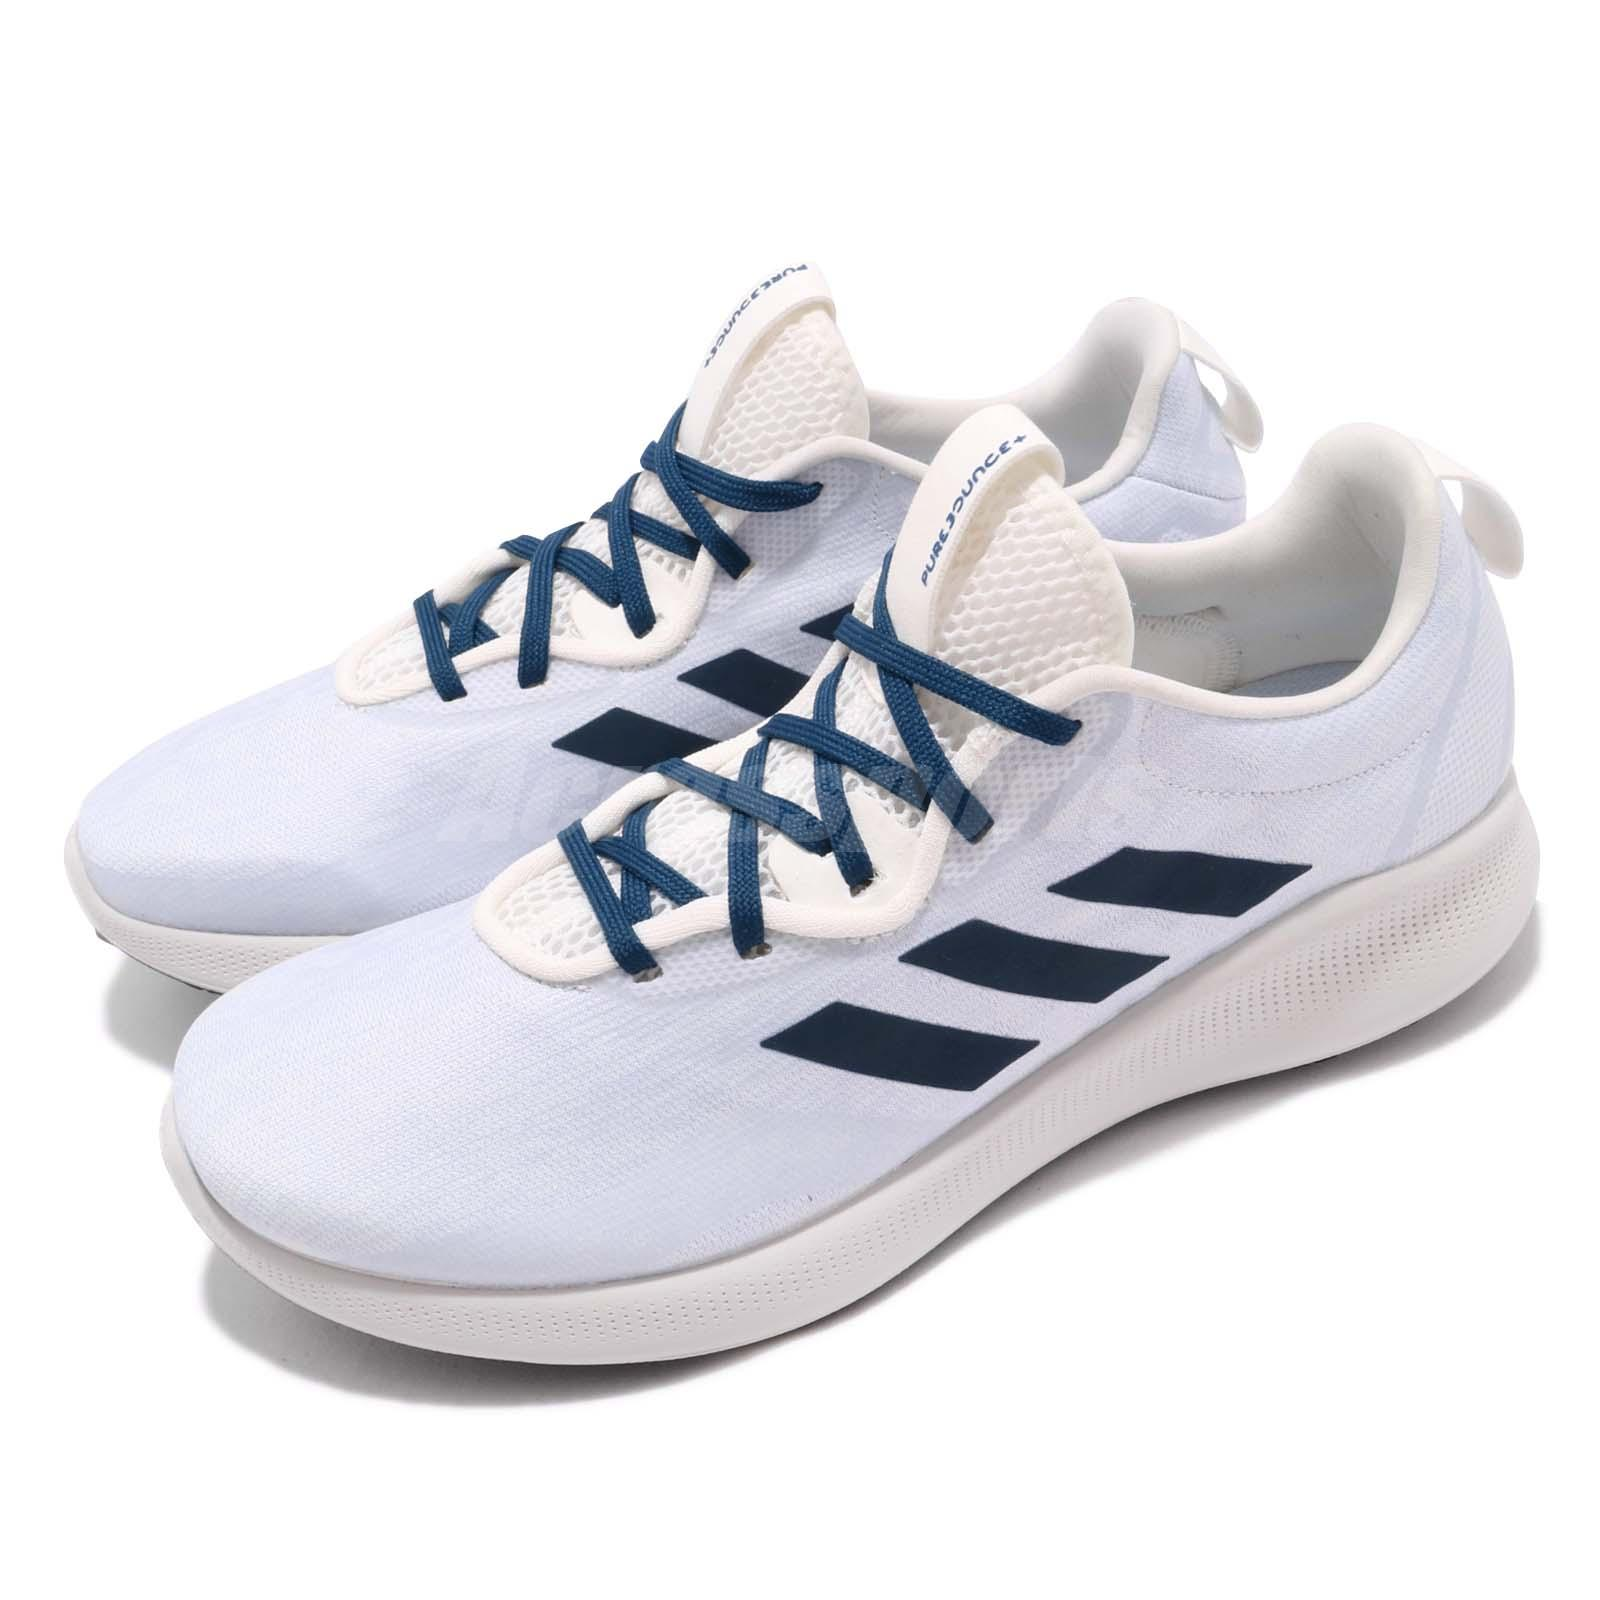 adidas Purebounce+ Street Shoes White   adidas US